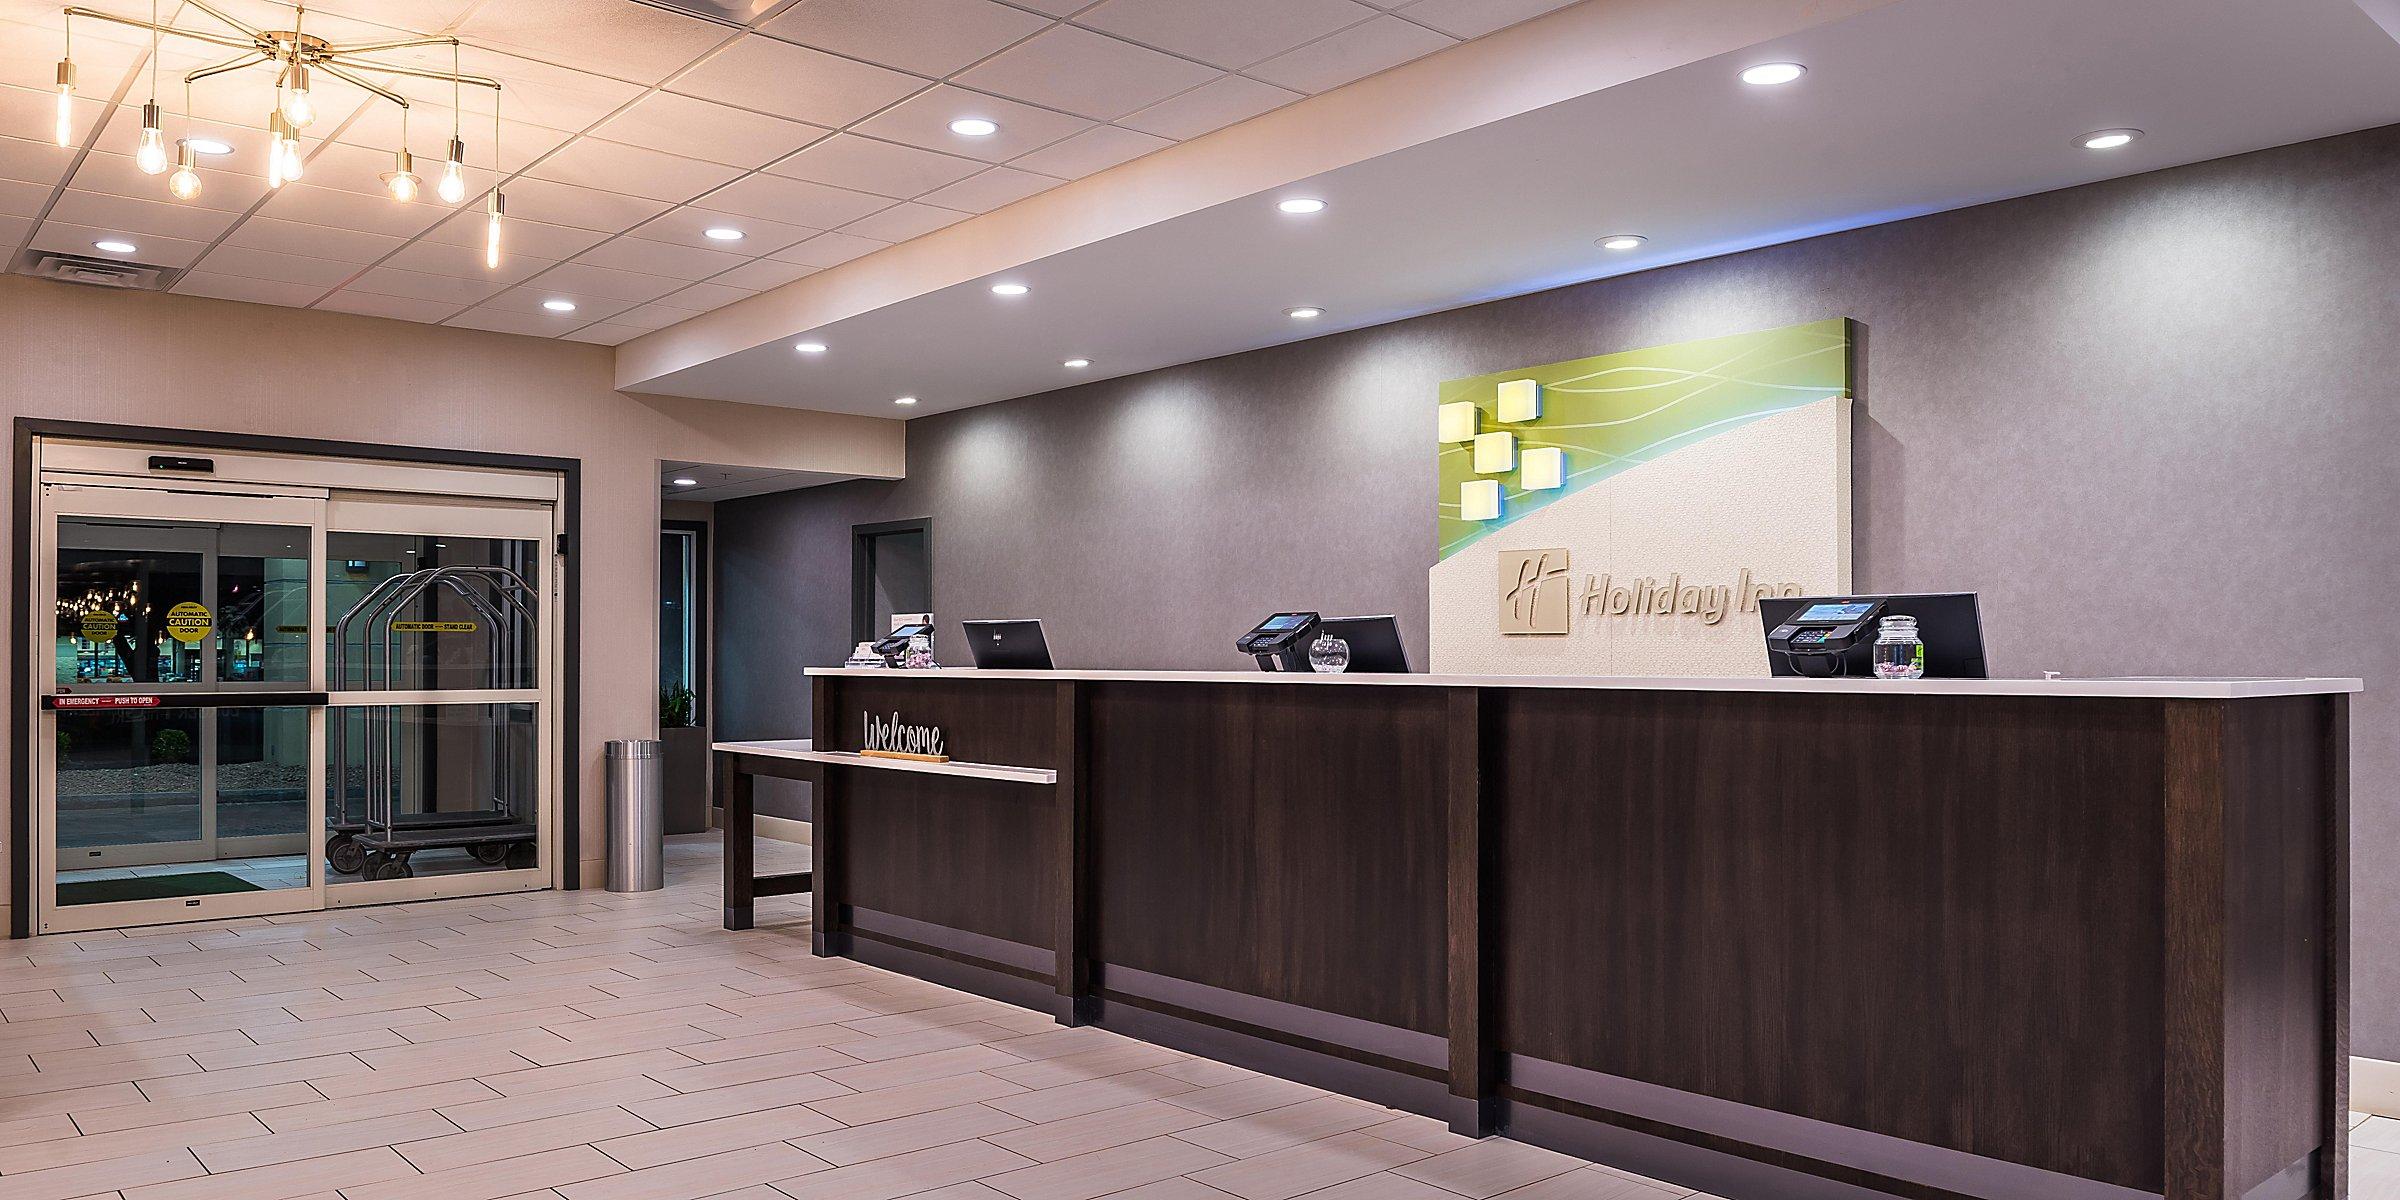 Hotels in Auburn, NY | Holiday Inn Auburn-Finger Lakes Region